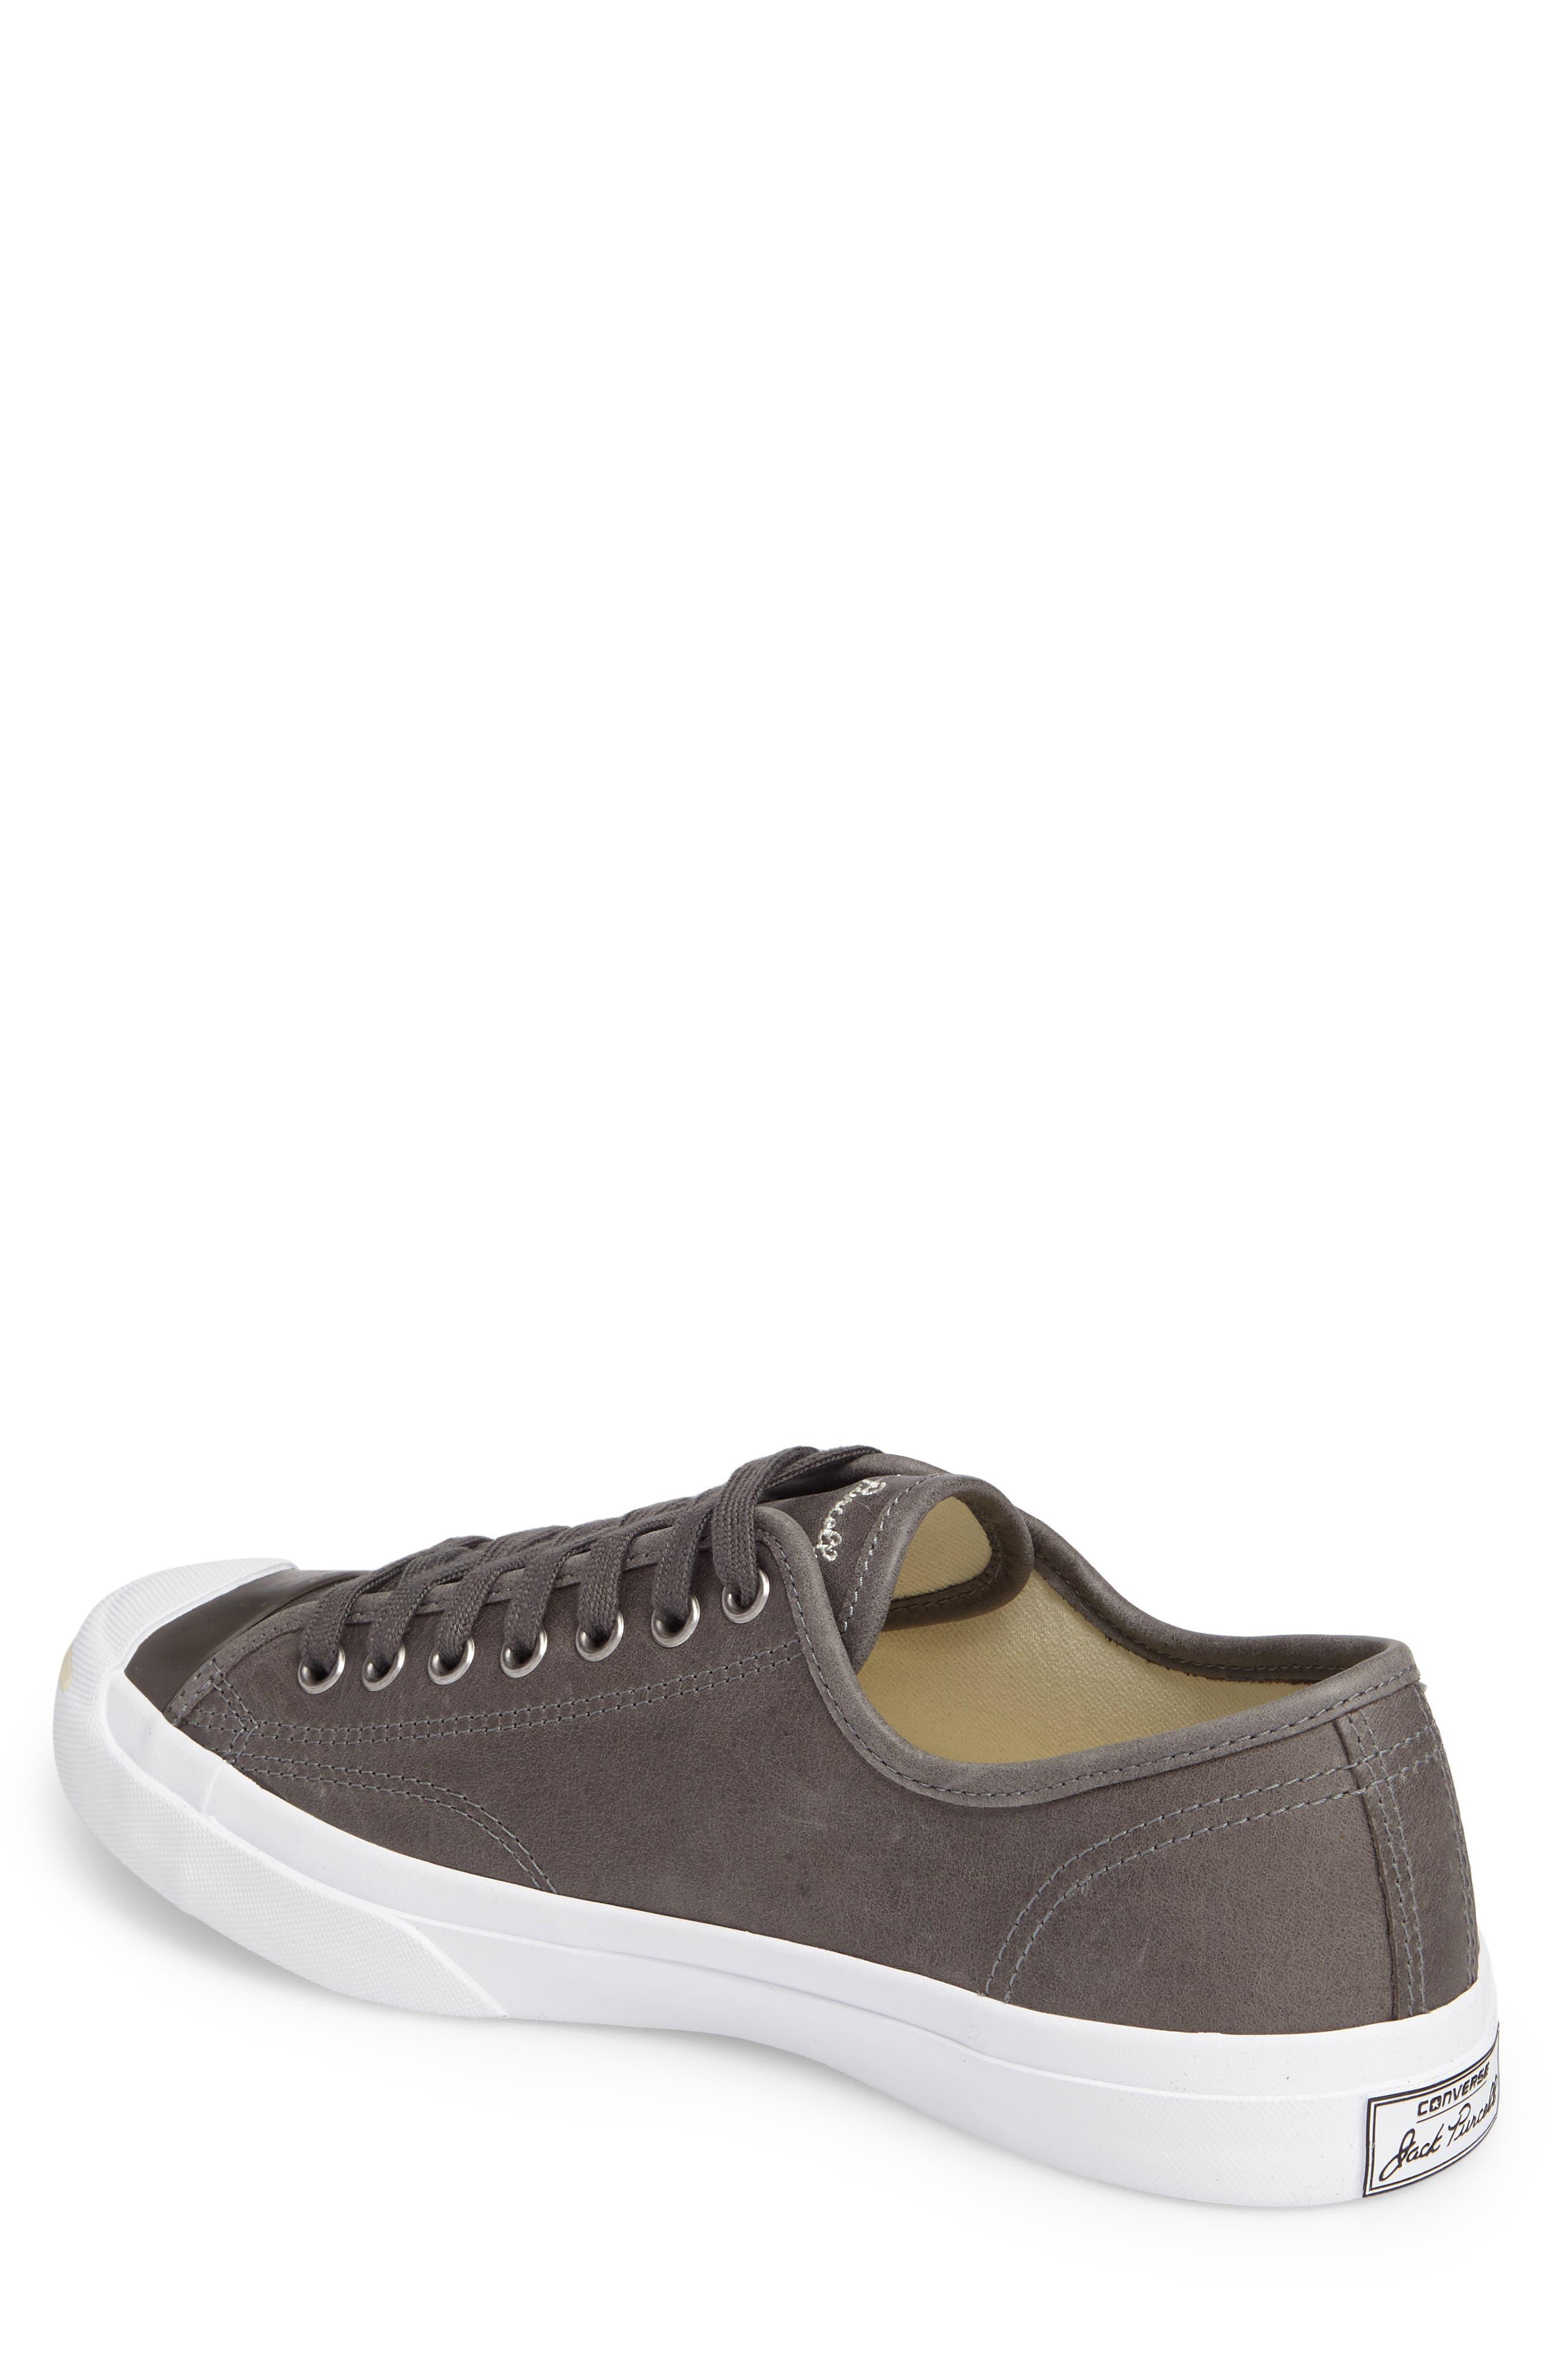 Alternate Image 2  - Converse 'Jack Purcell - Jack' Sneaker (Men)